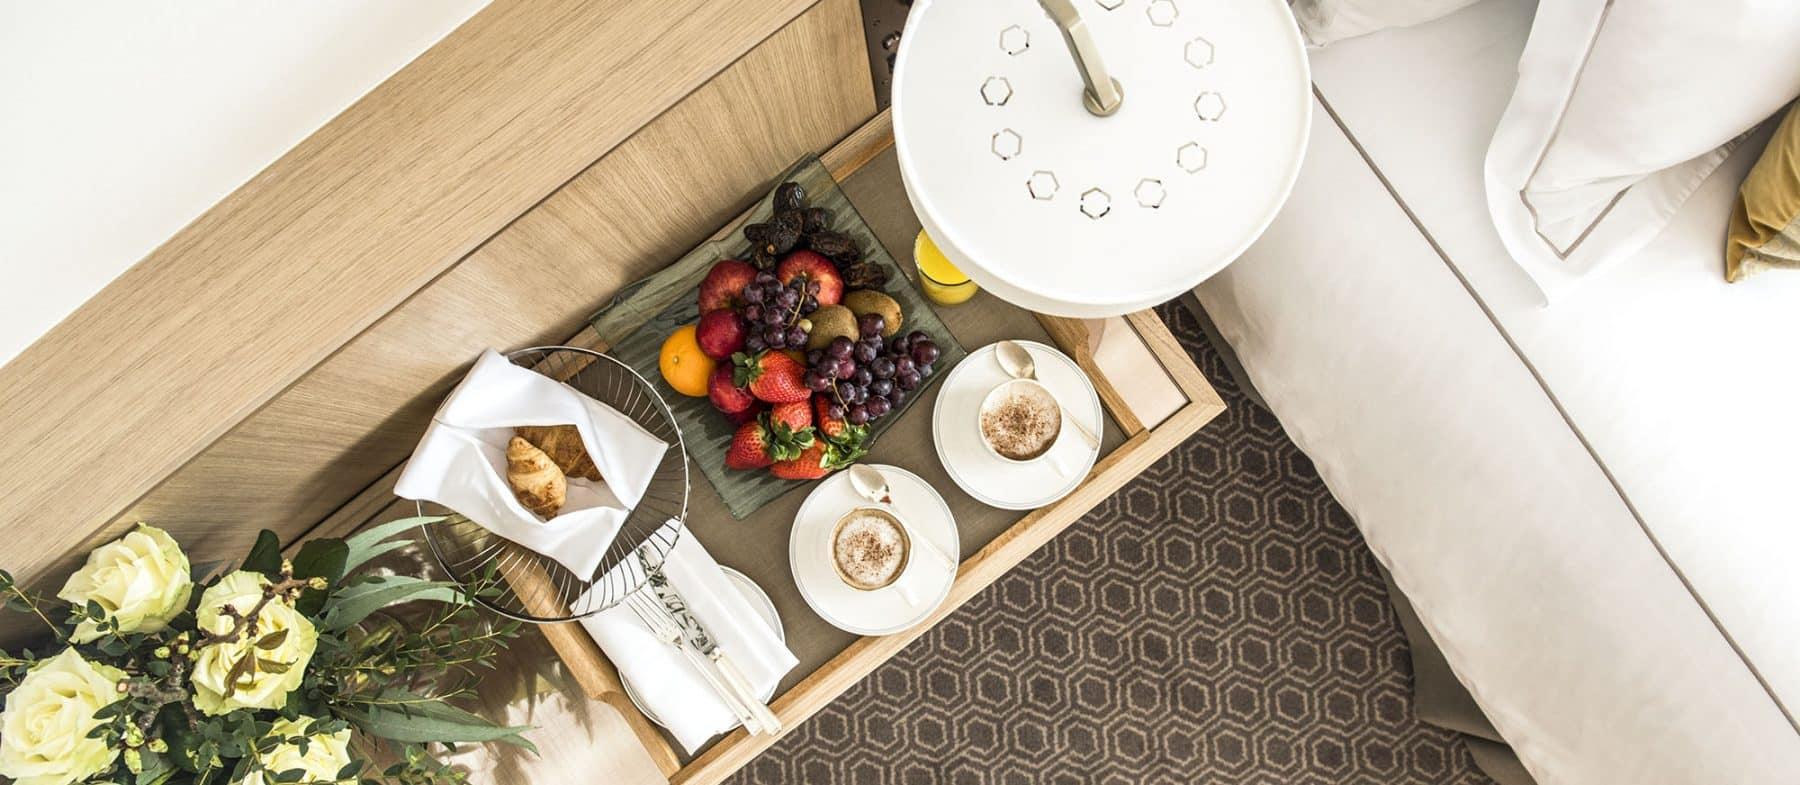 Executive Luxury hotel rooms